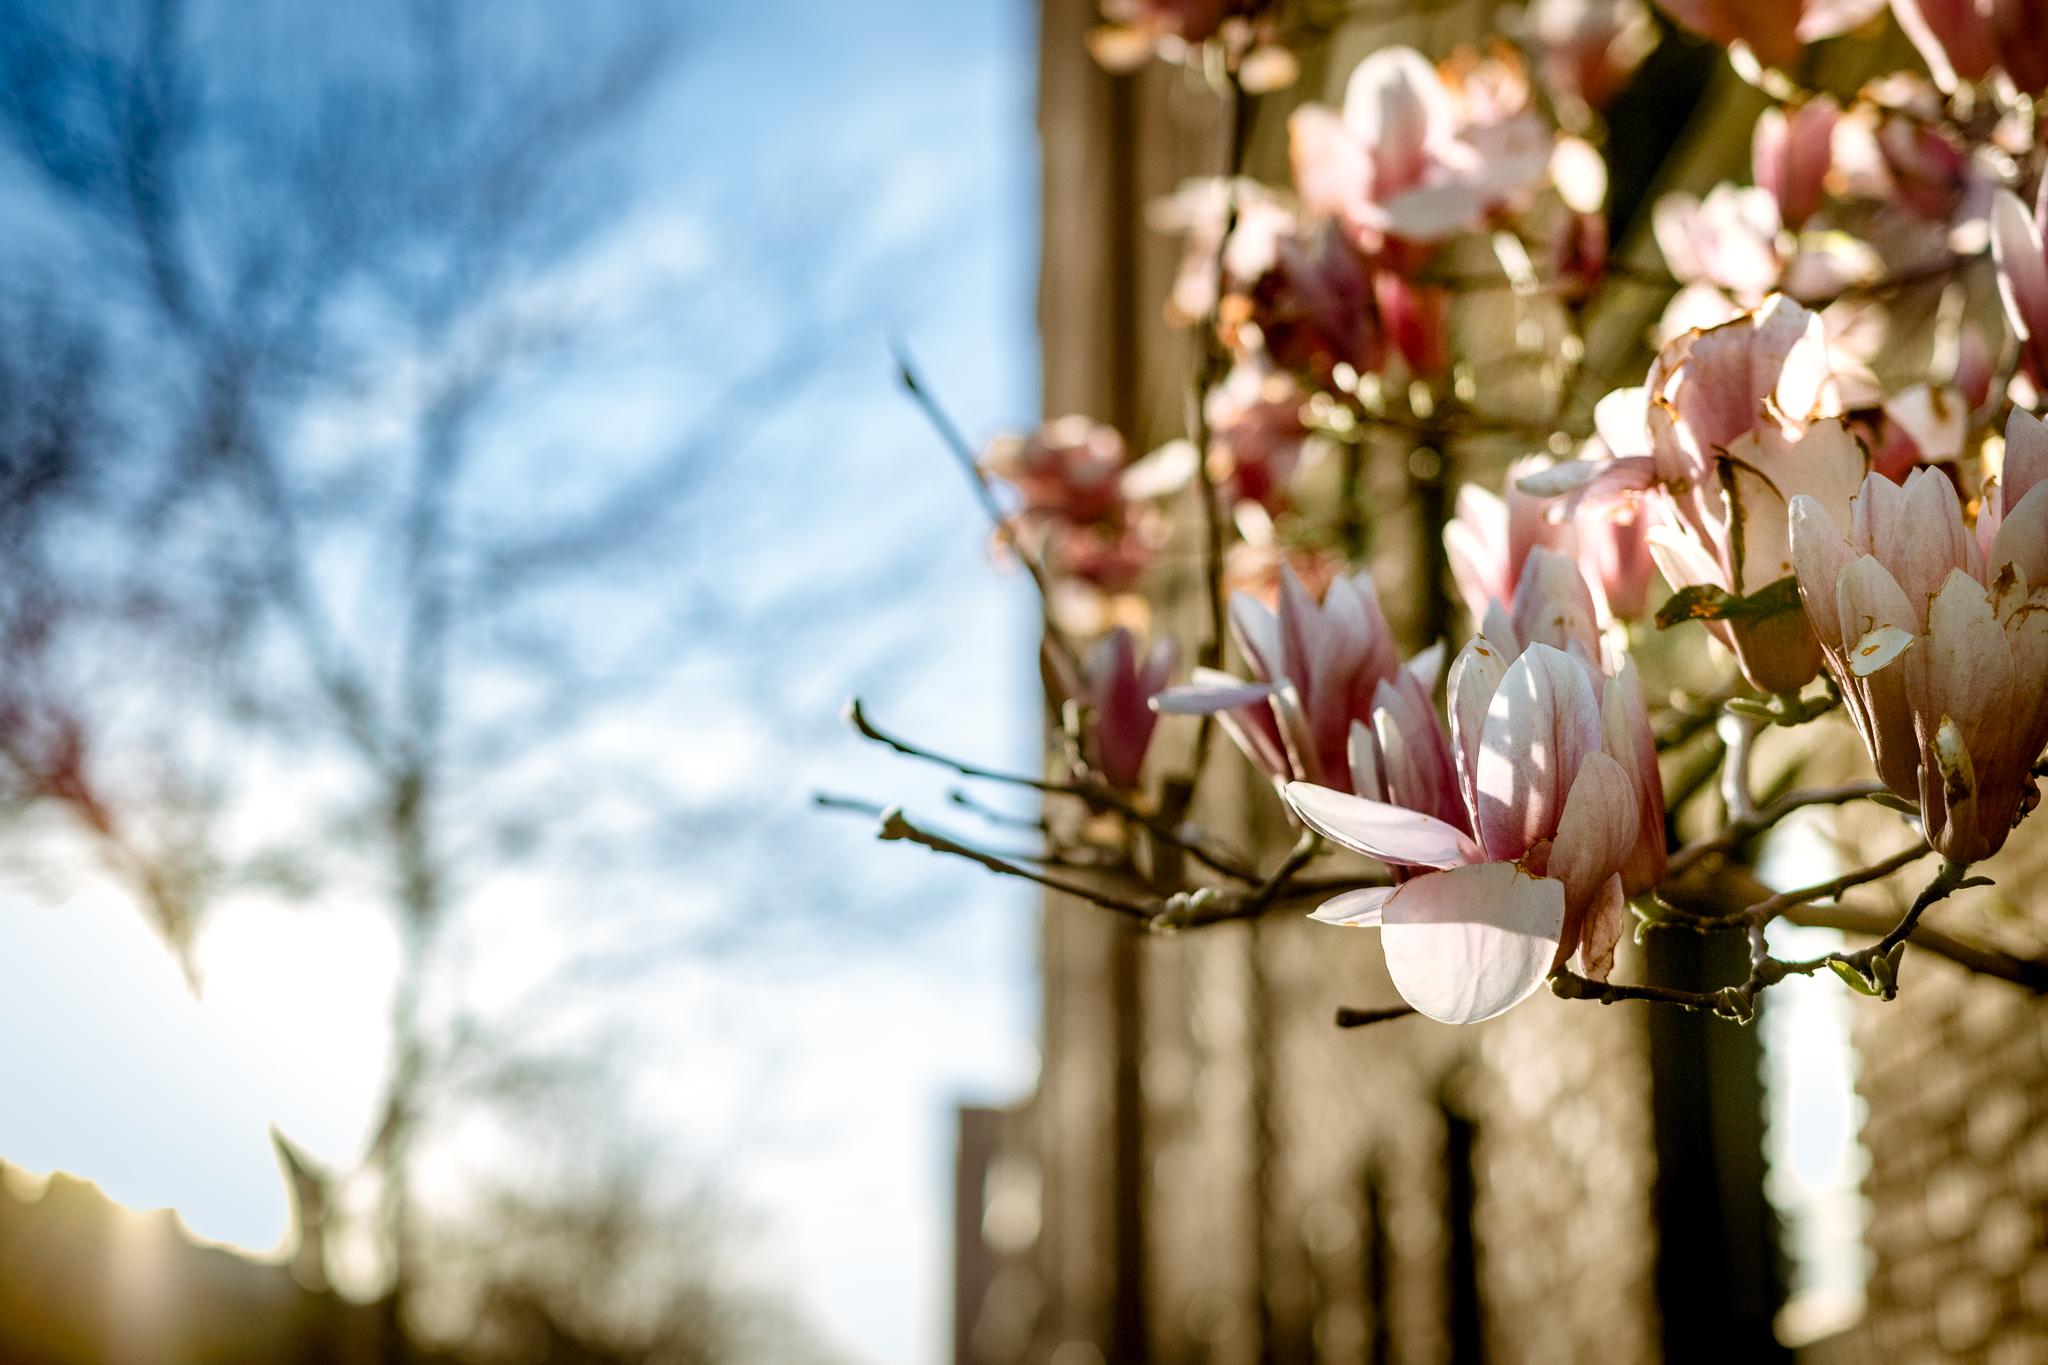 New York Spring Break-VA-160330-3556